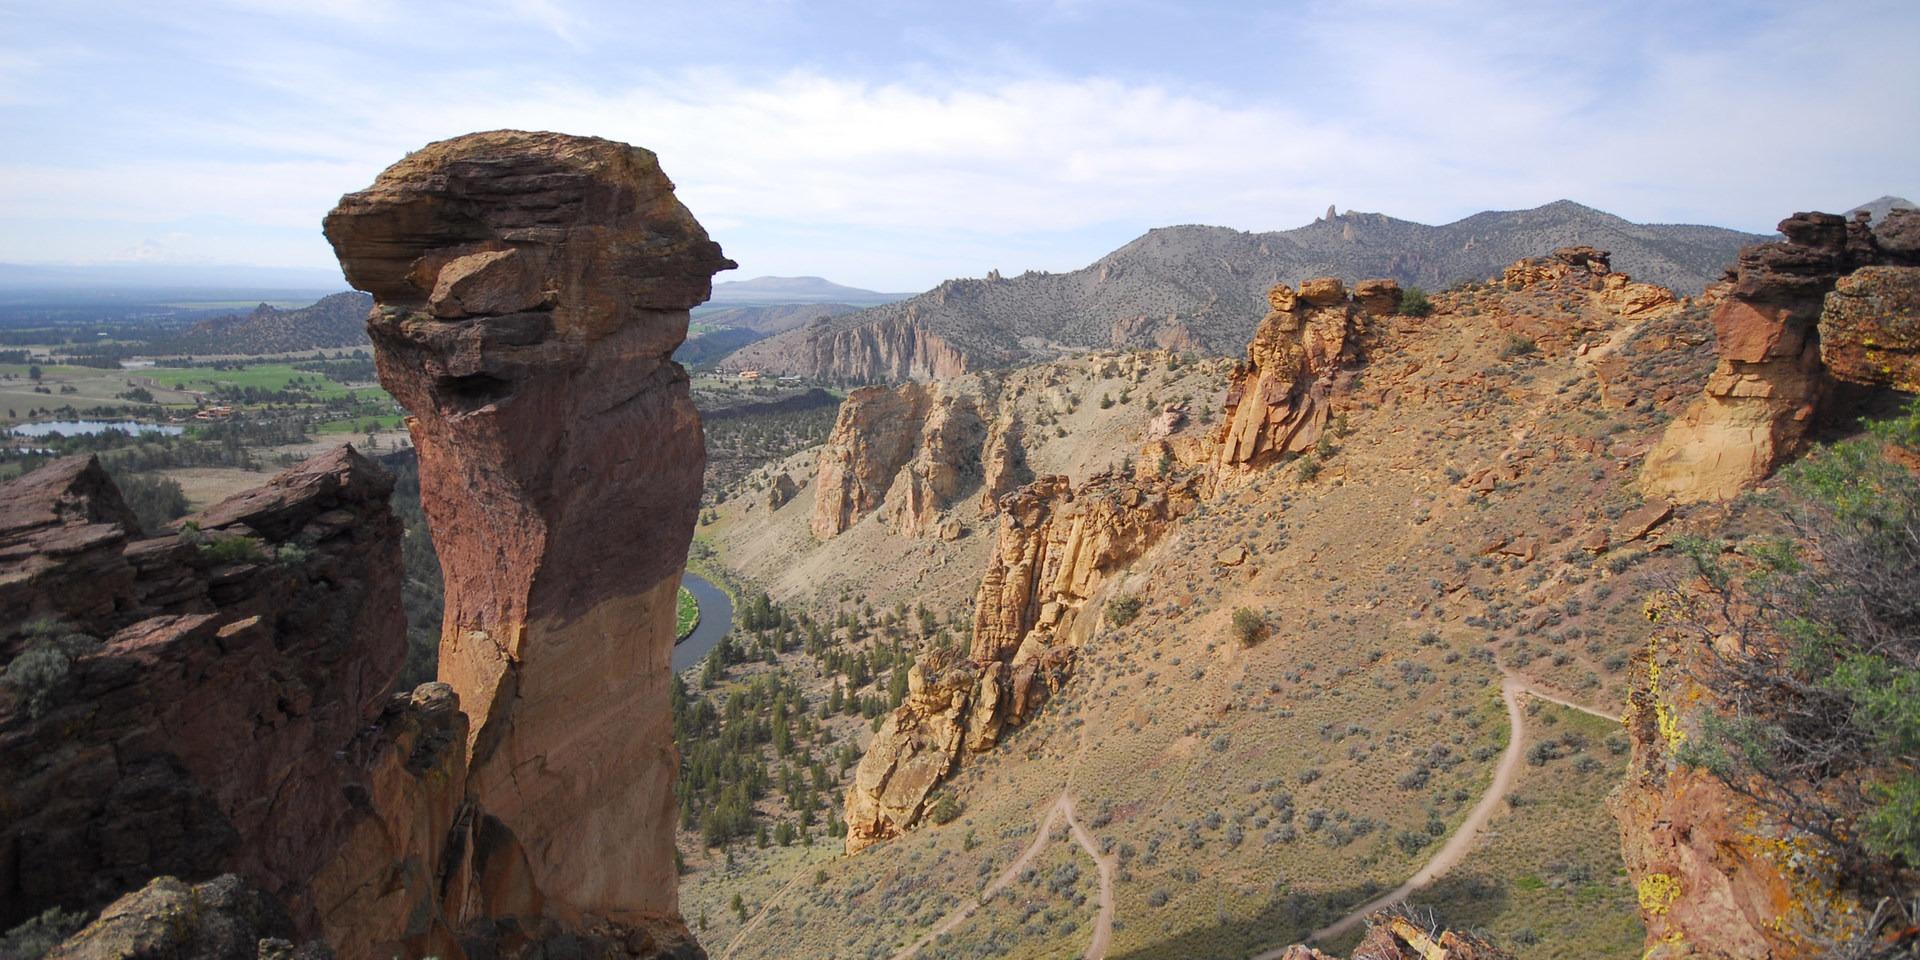 smith rock misery ridge hiking trail  outdoor project - smith rock misery ridge hiking trail